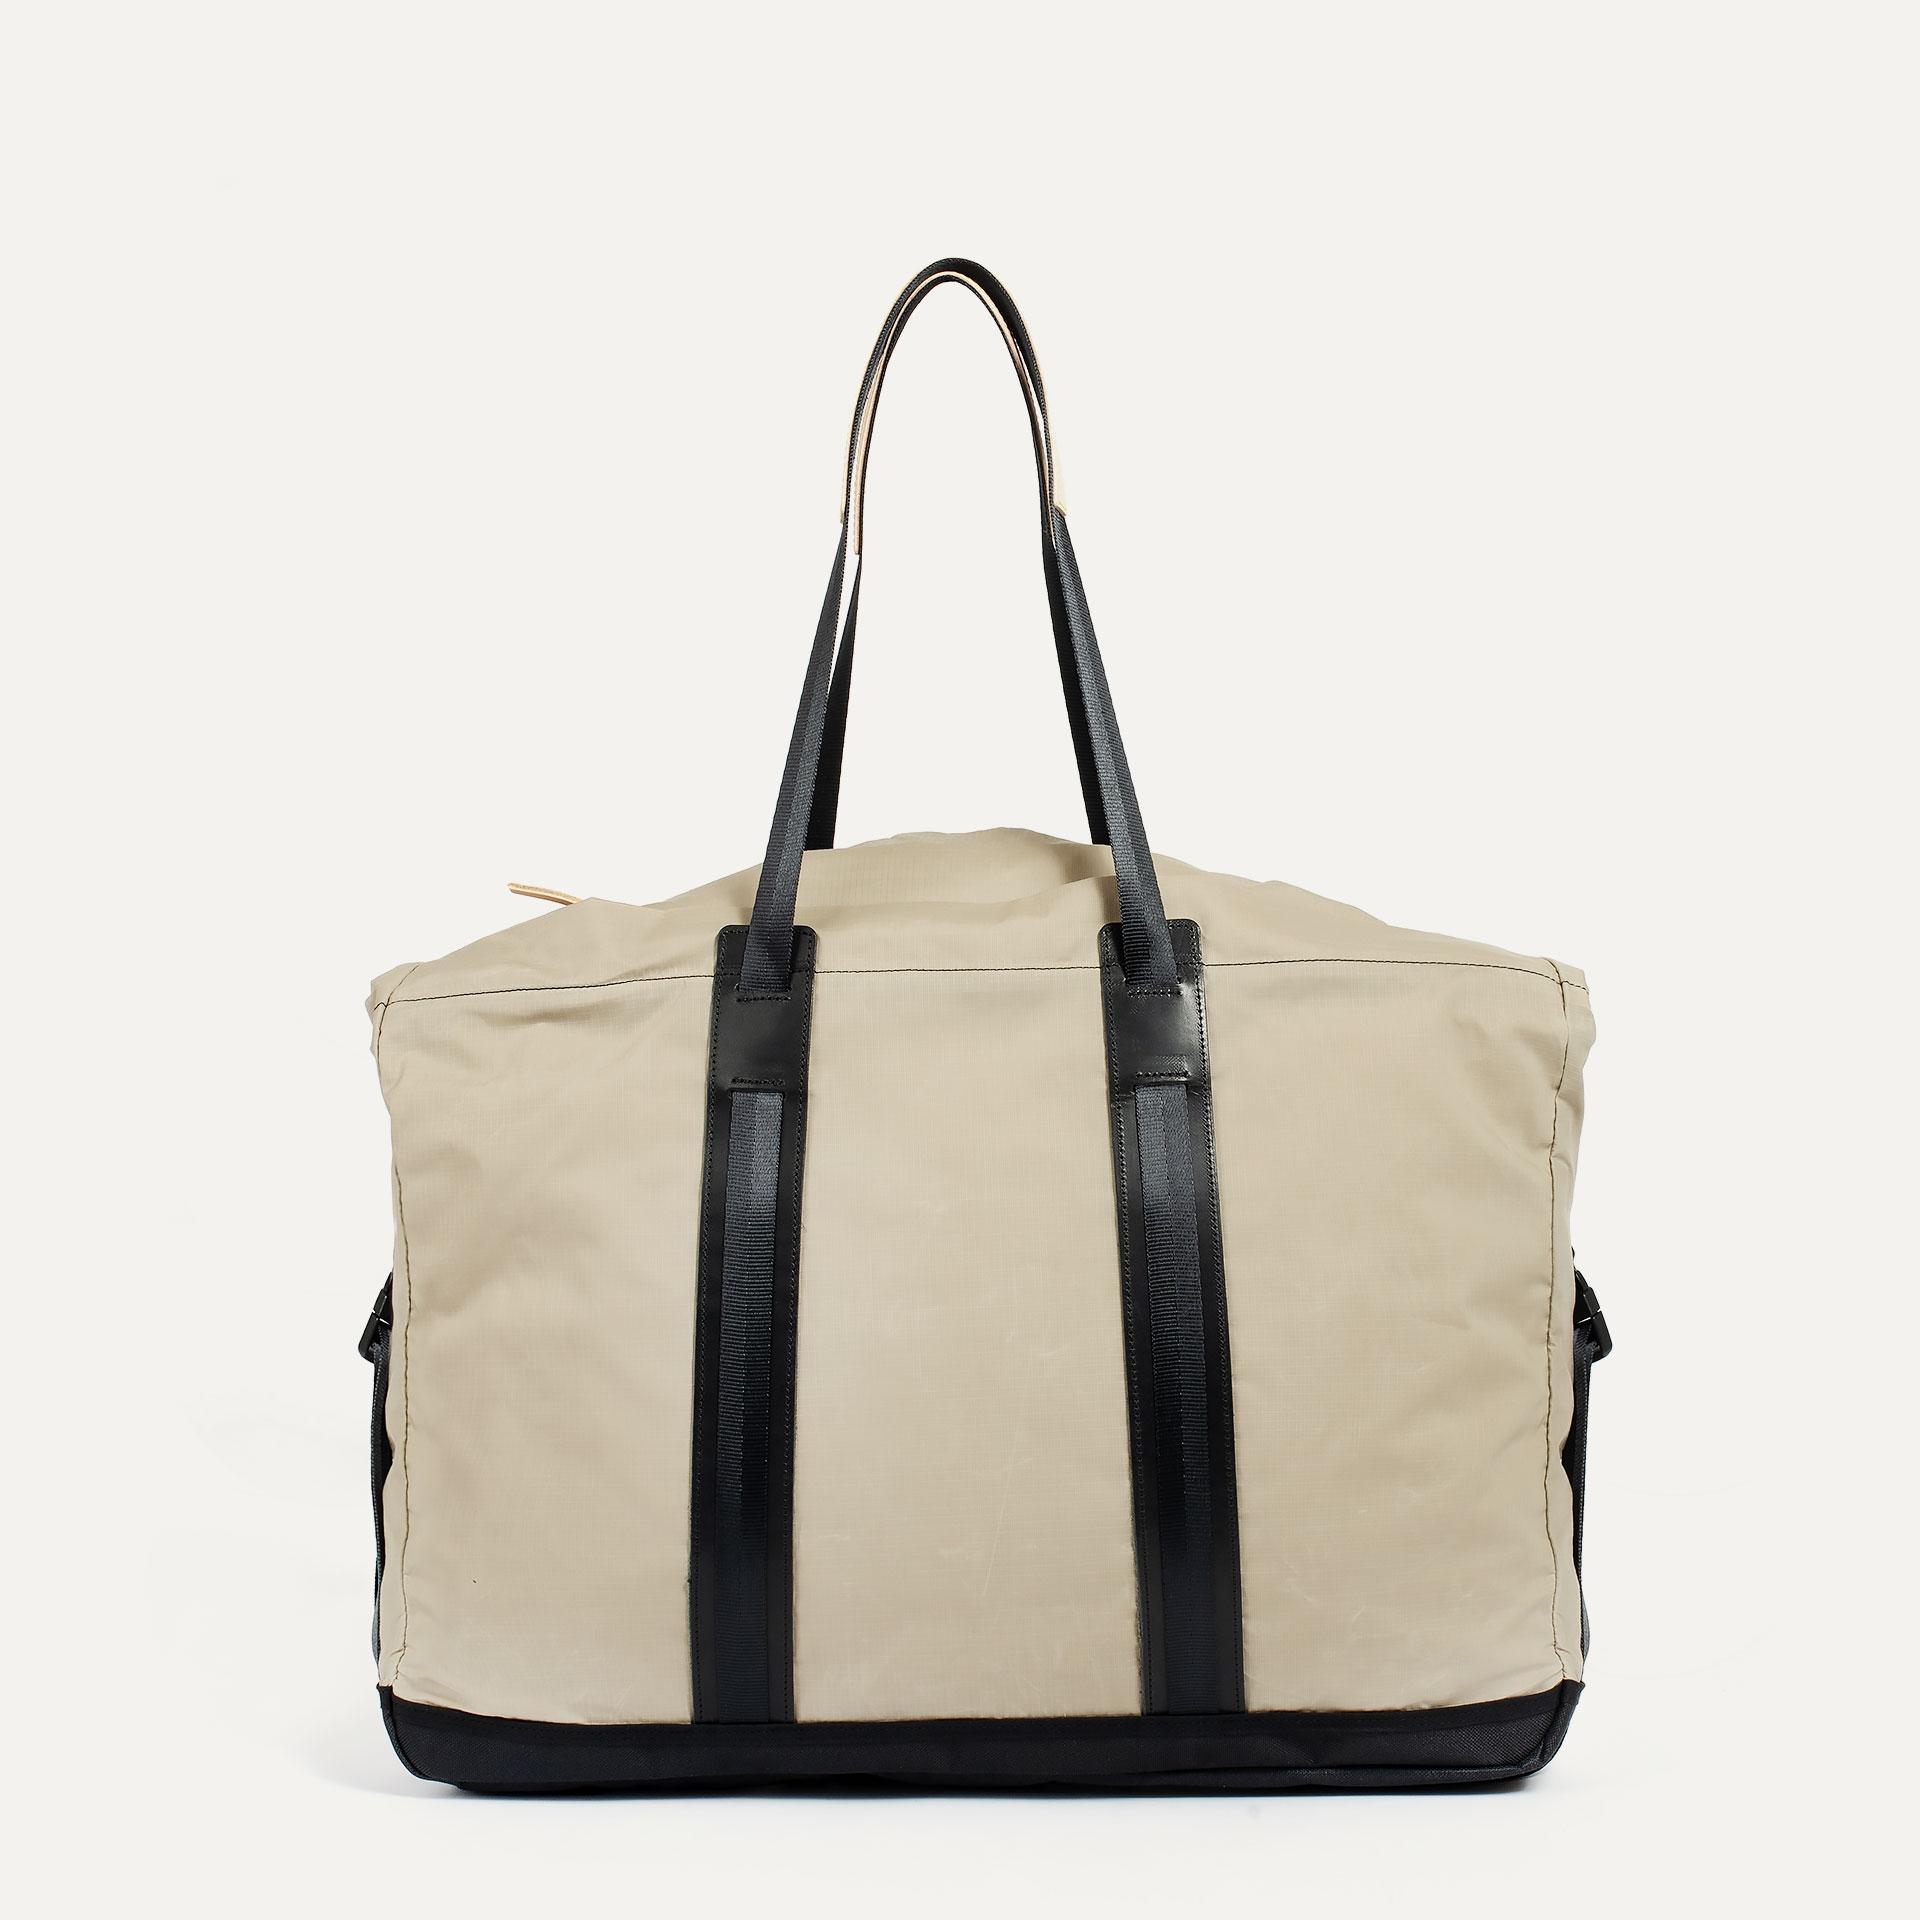 15L Barda Tote bag - Beige (image n°3)